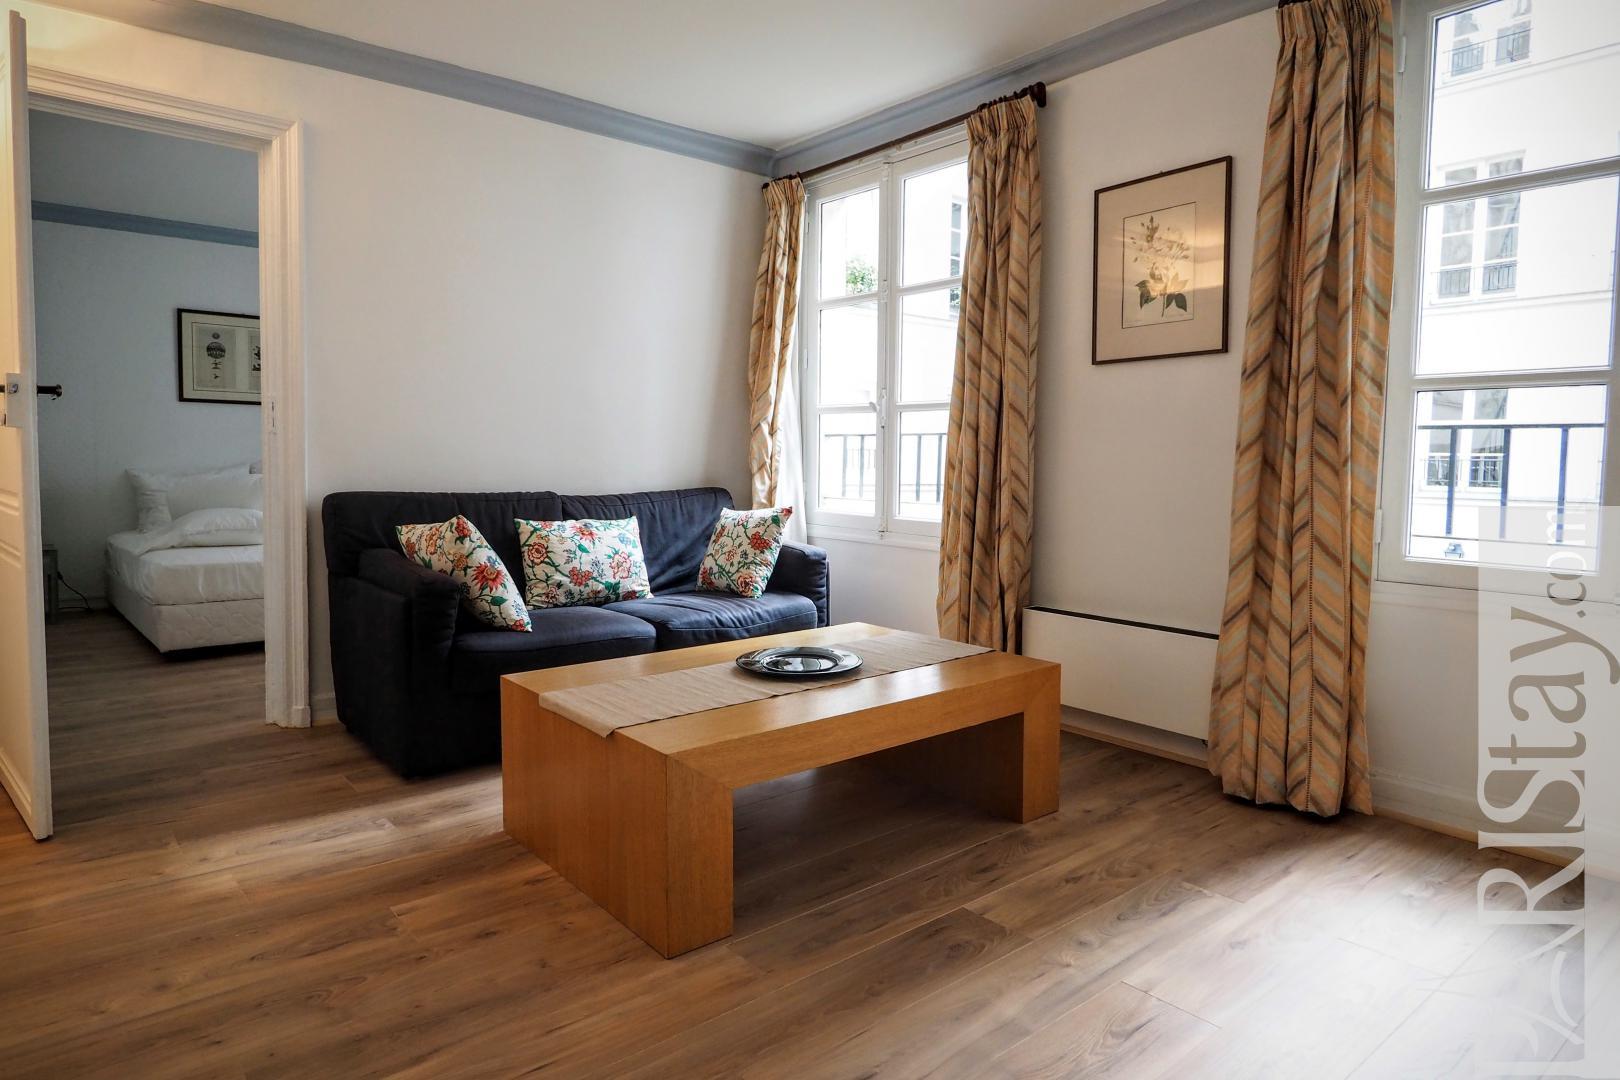 01d2bc1882 Paris flat rentals one bedroom apartment for rent Louvre